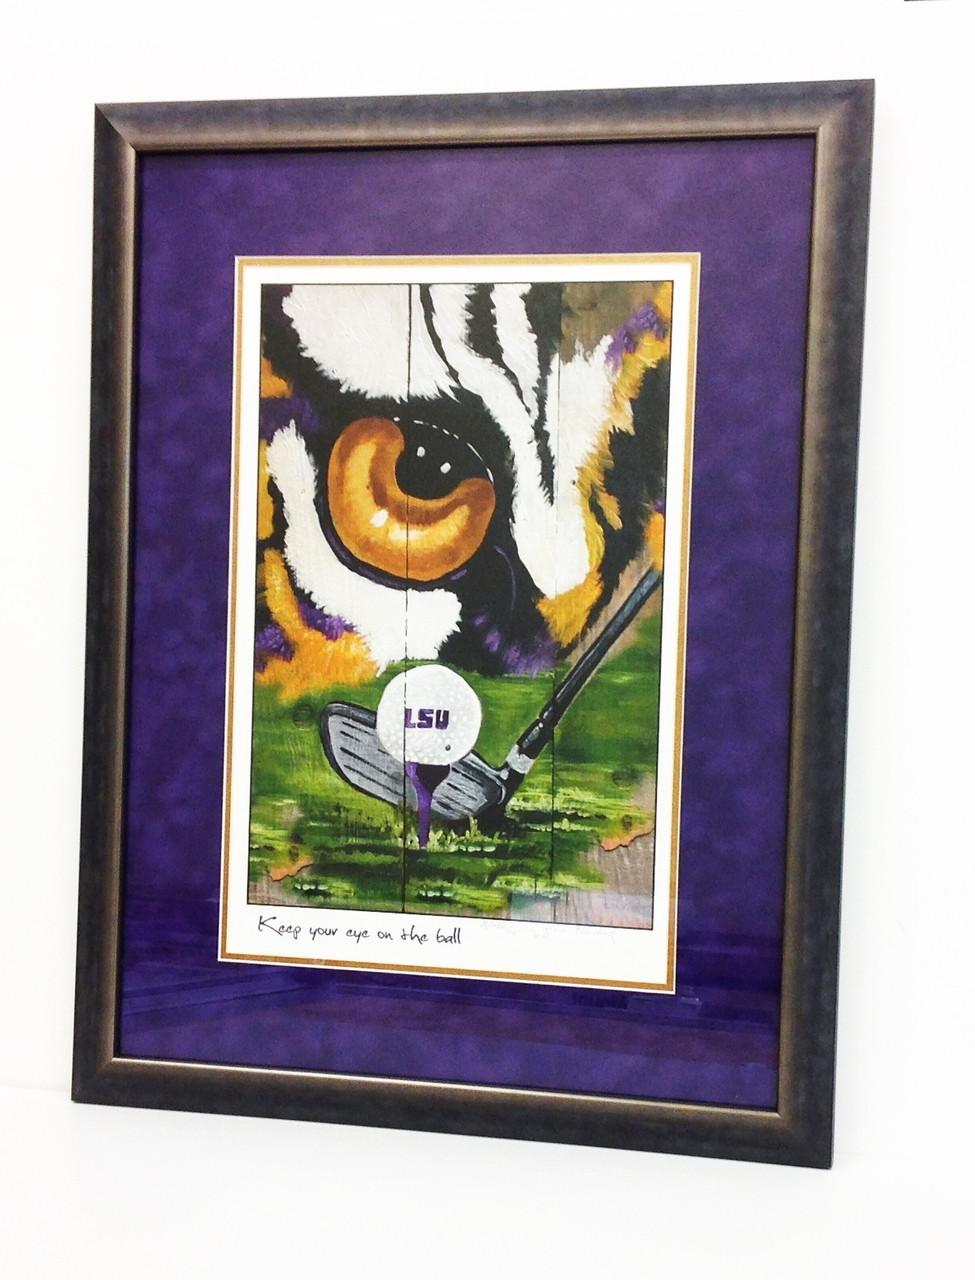 LSU Golf Print Framed - Lagniappe Frame Shoppe and Fleur deSign Studio